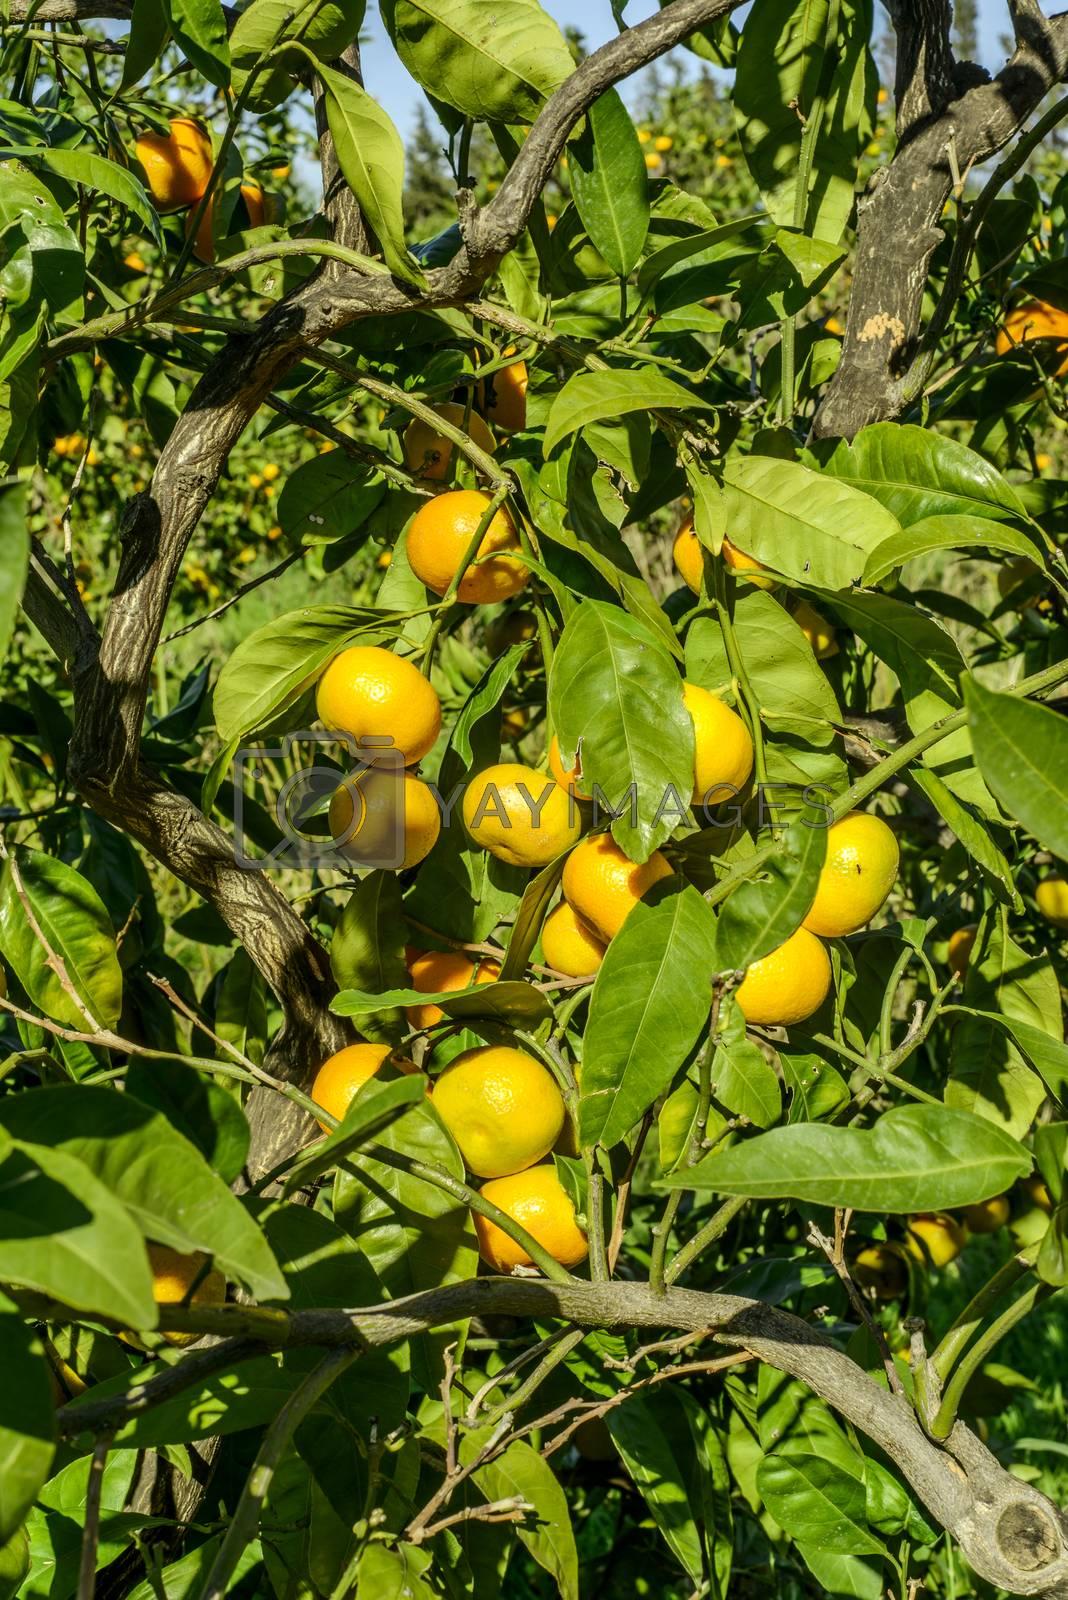 Royalty free image of Mandarin Oranges by emirkoo